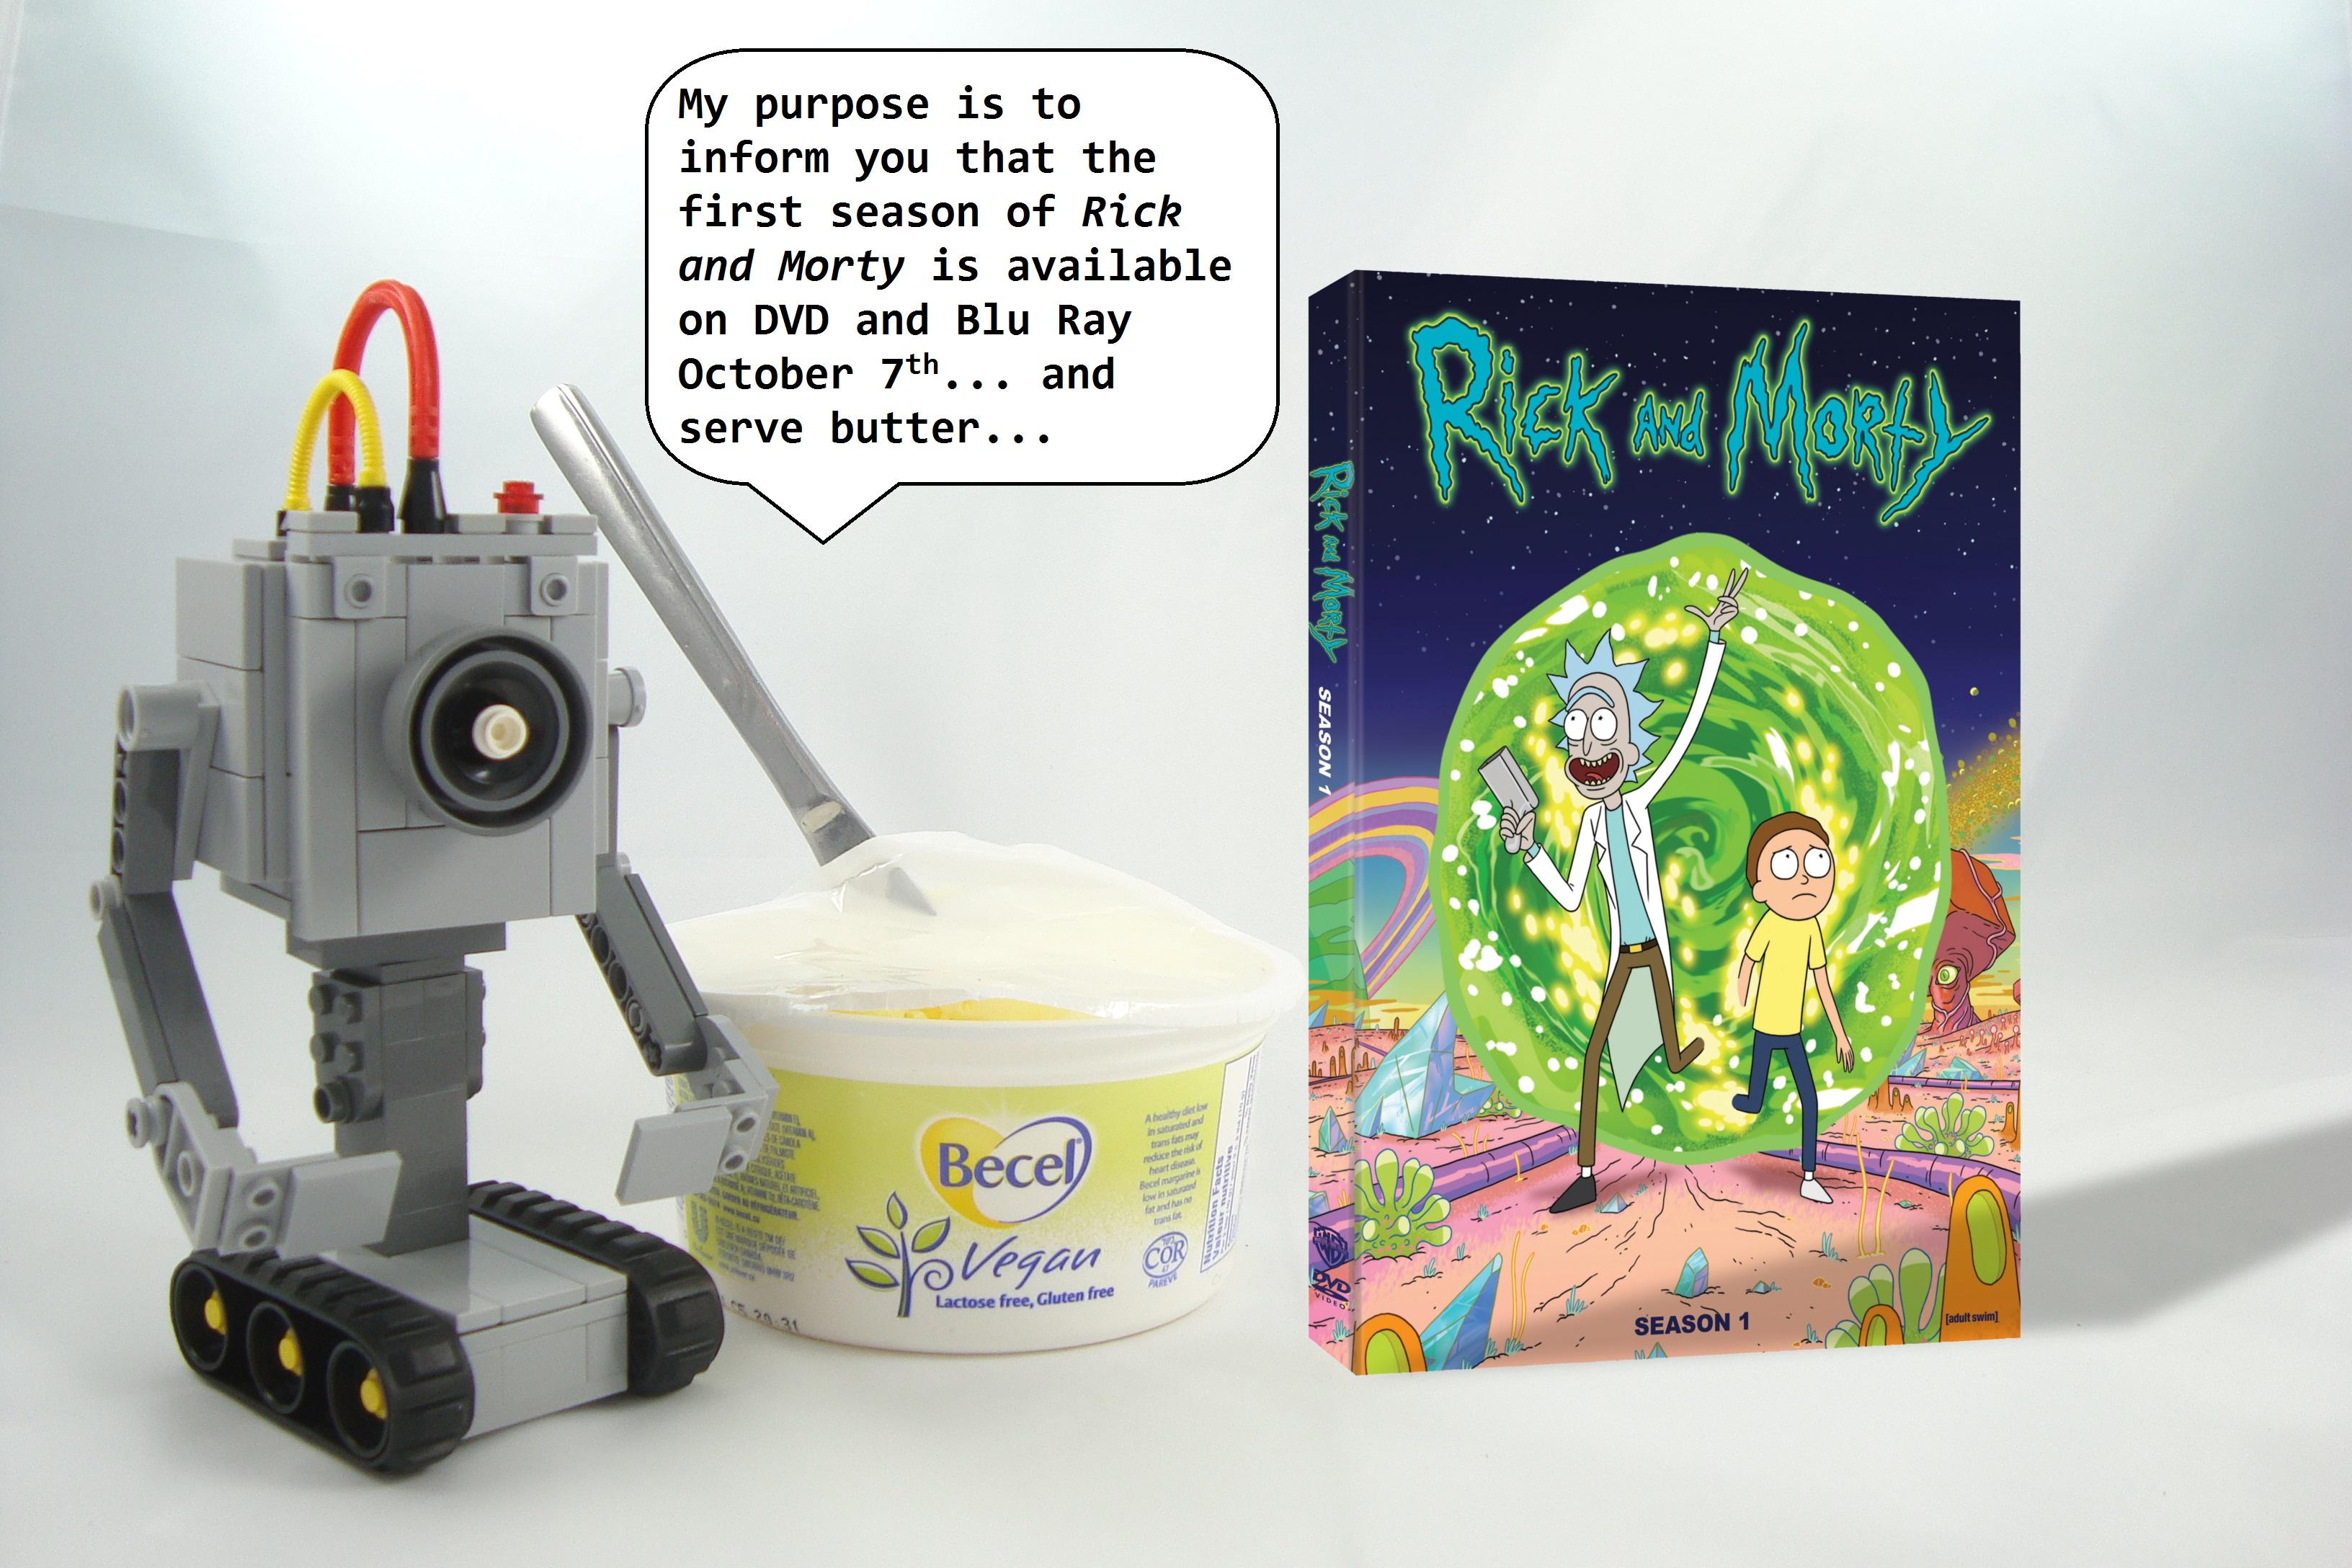 wallpaper robot graphic design lego technology toy butter